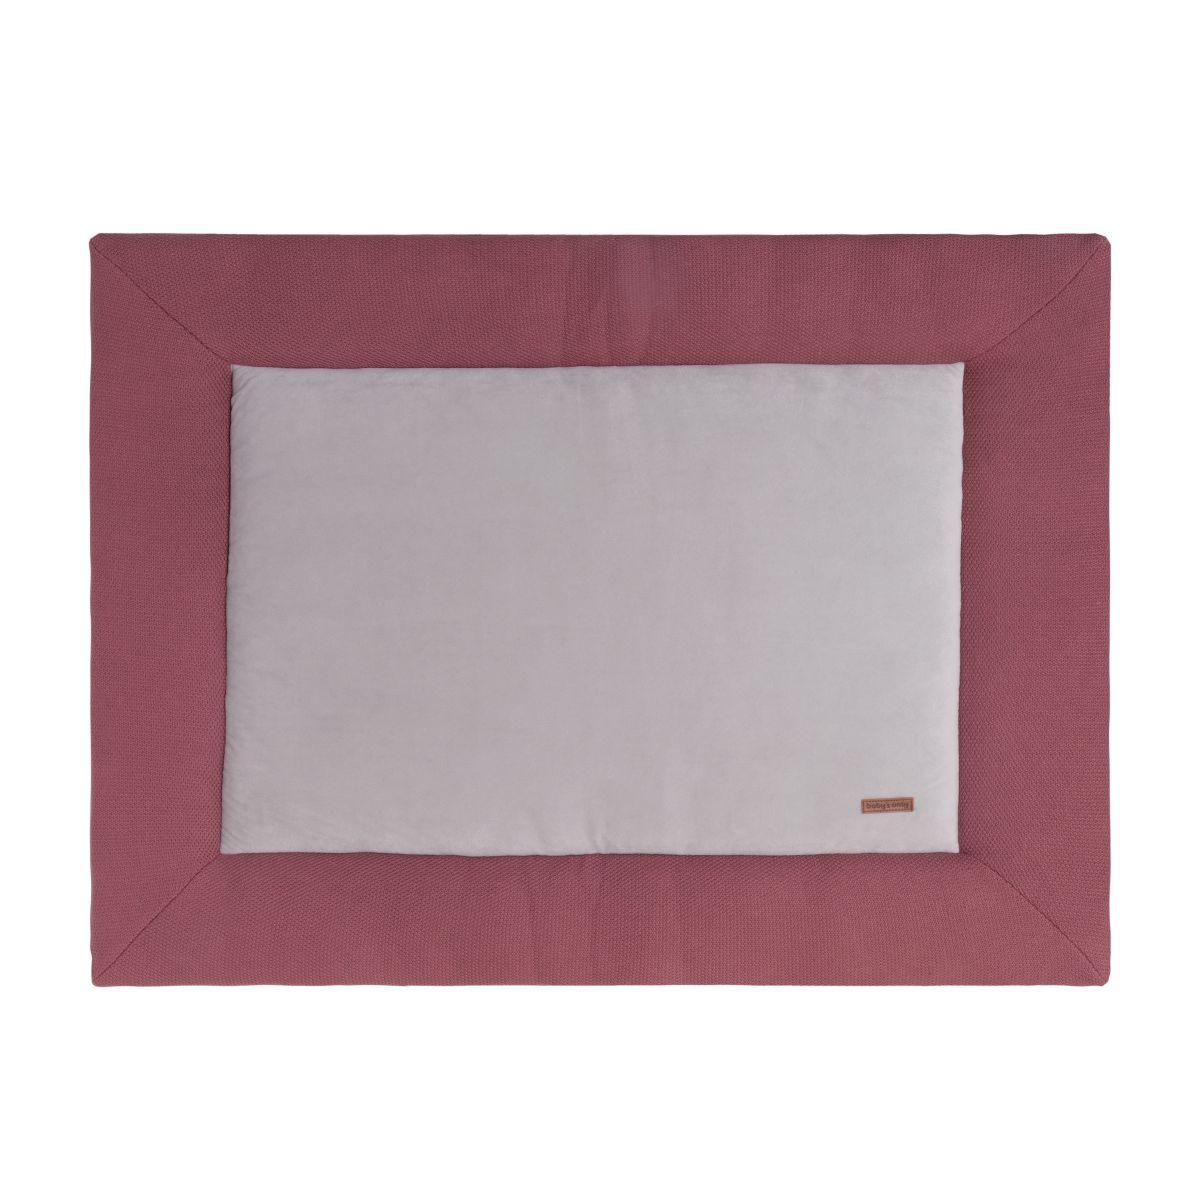 playpen mat classic stone red 75x95